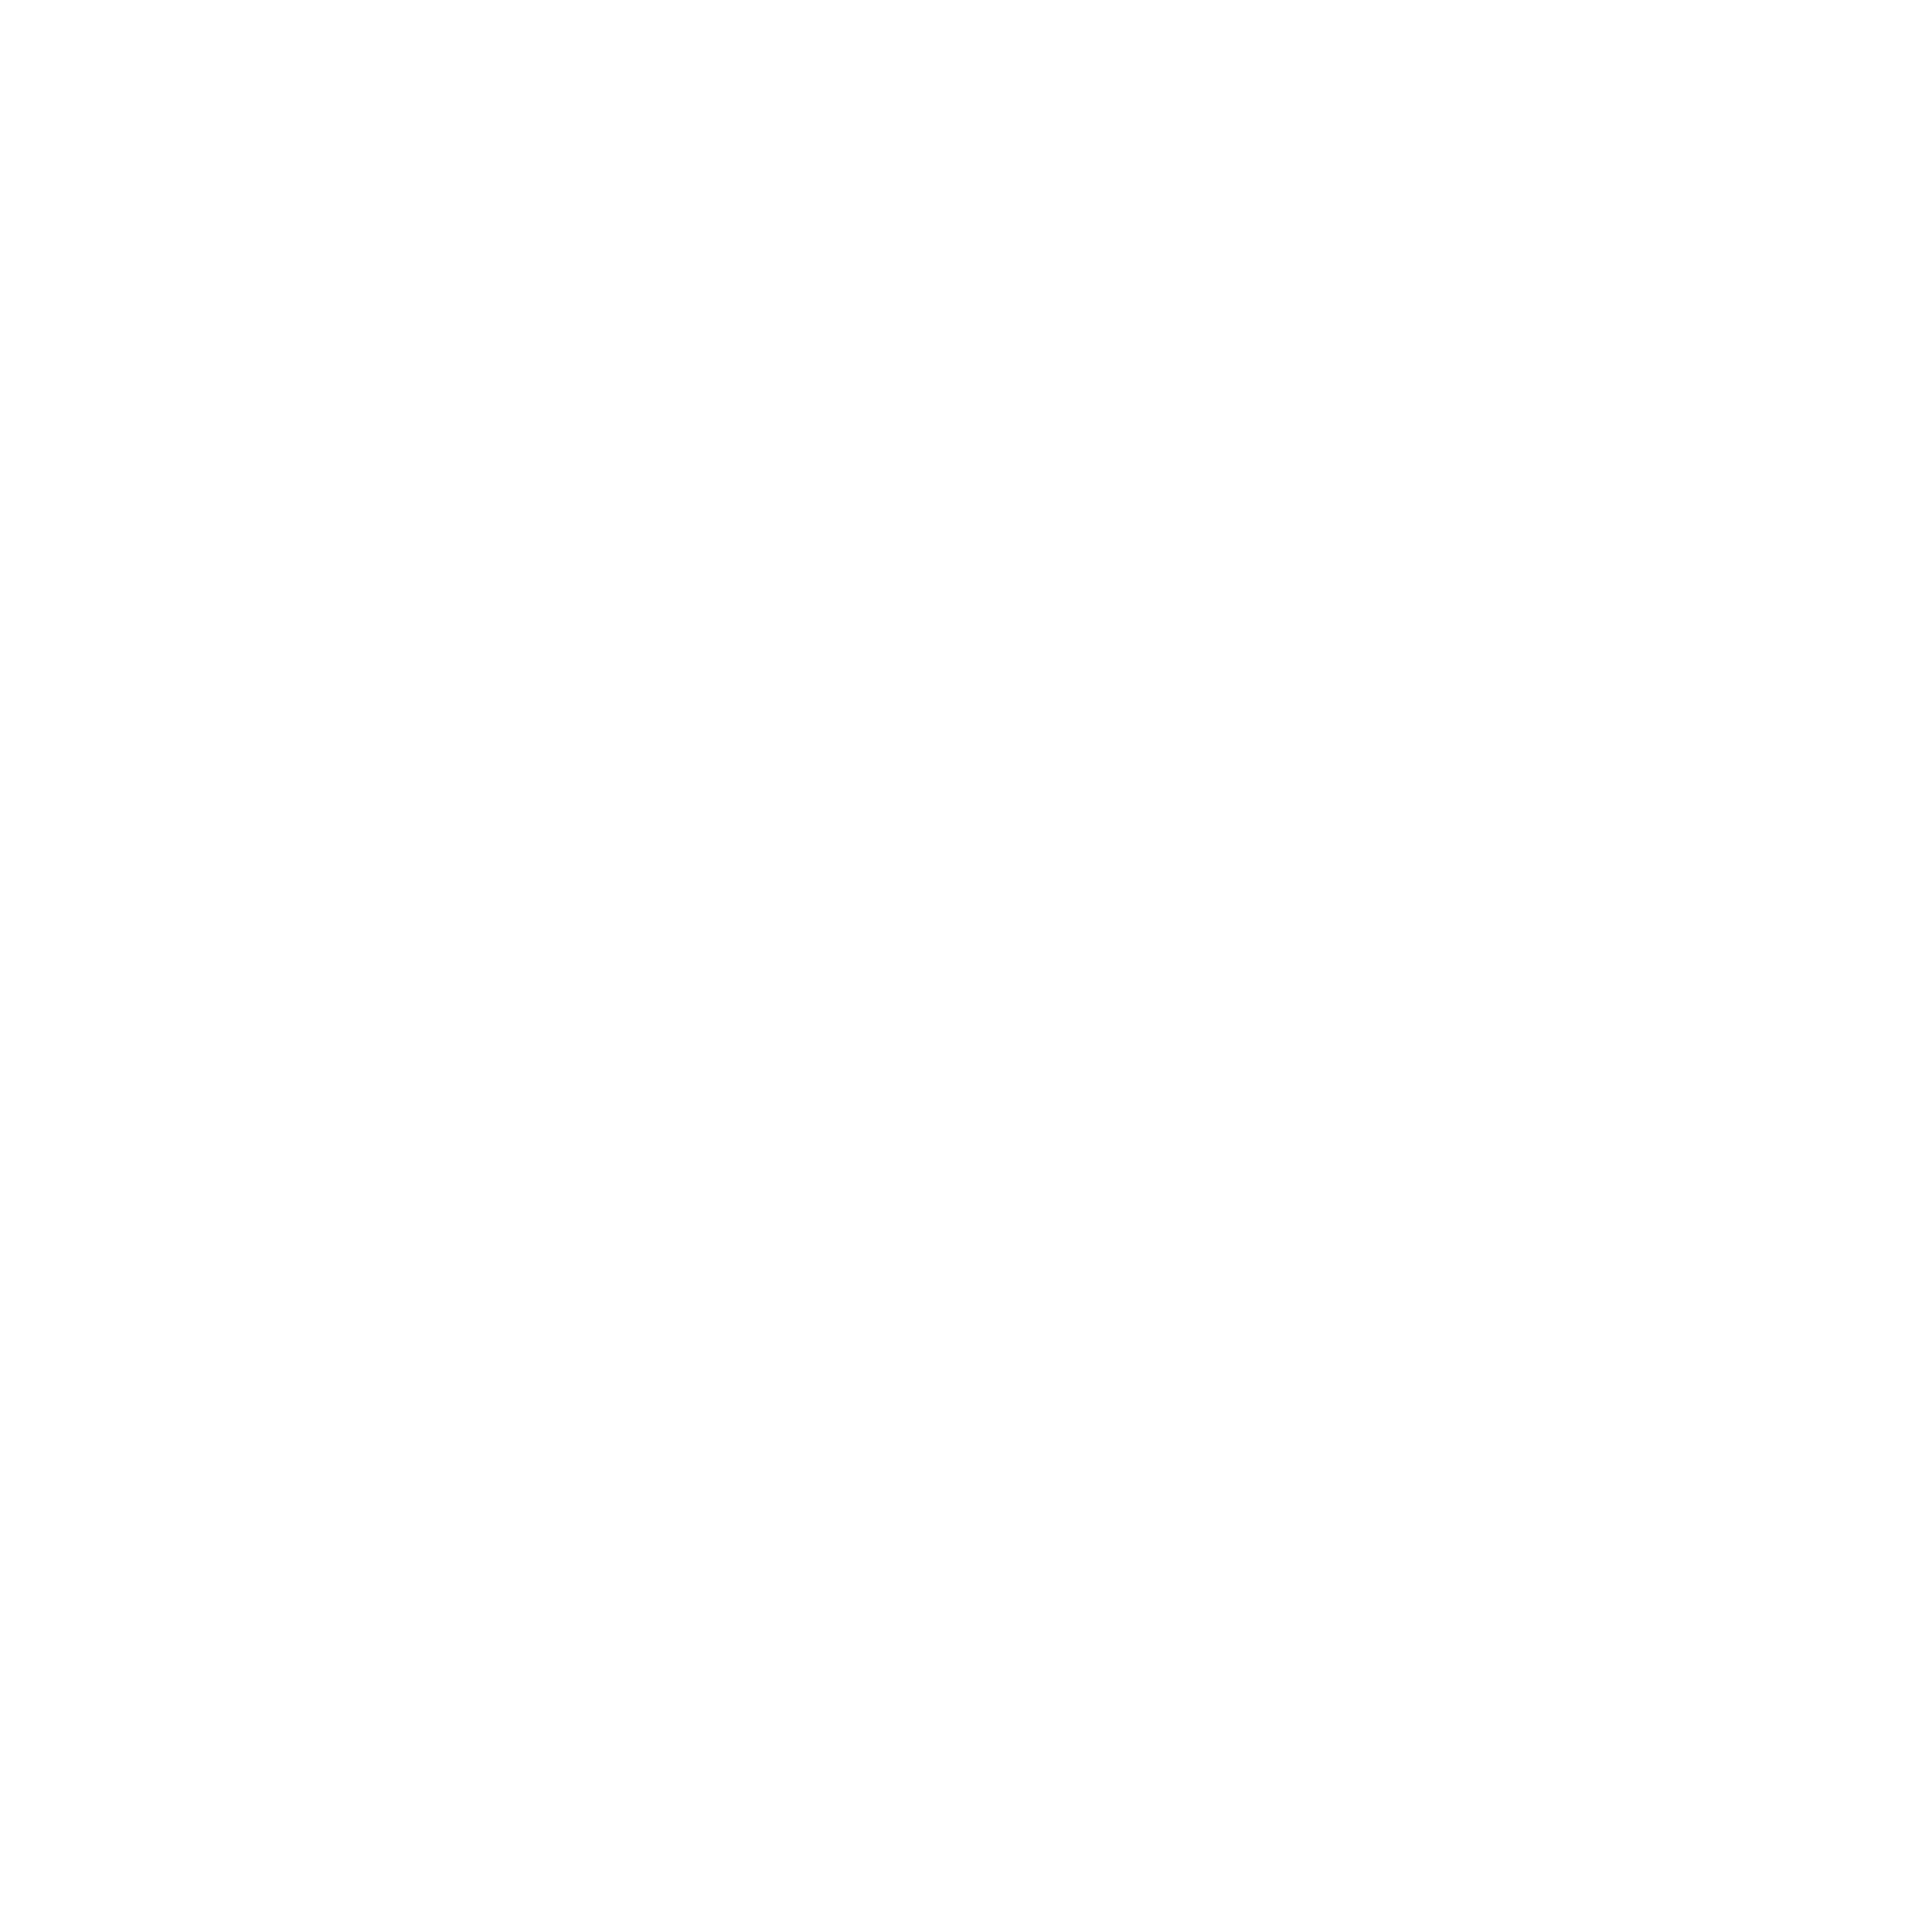 jacqueline mcleish